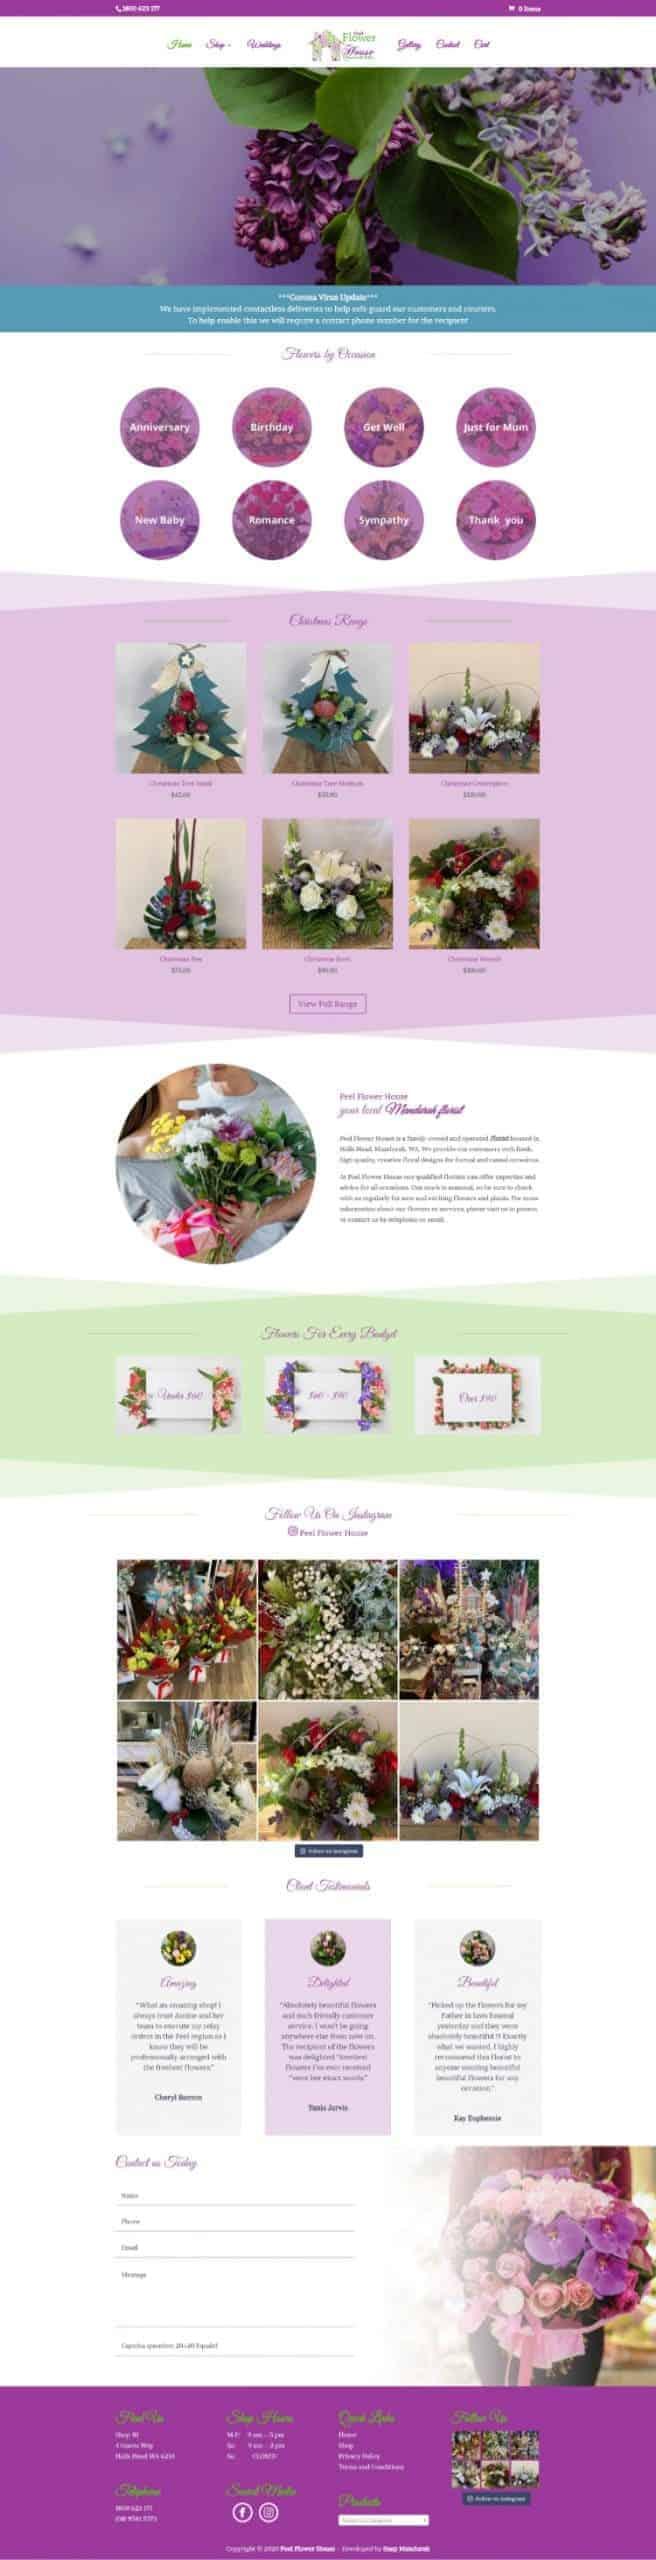 WordPress Website Design Mandurah